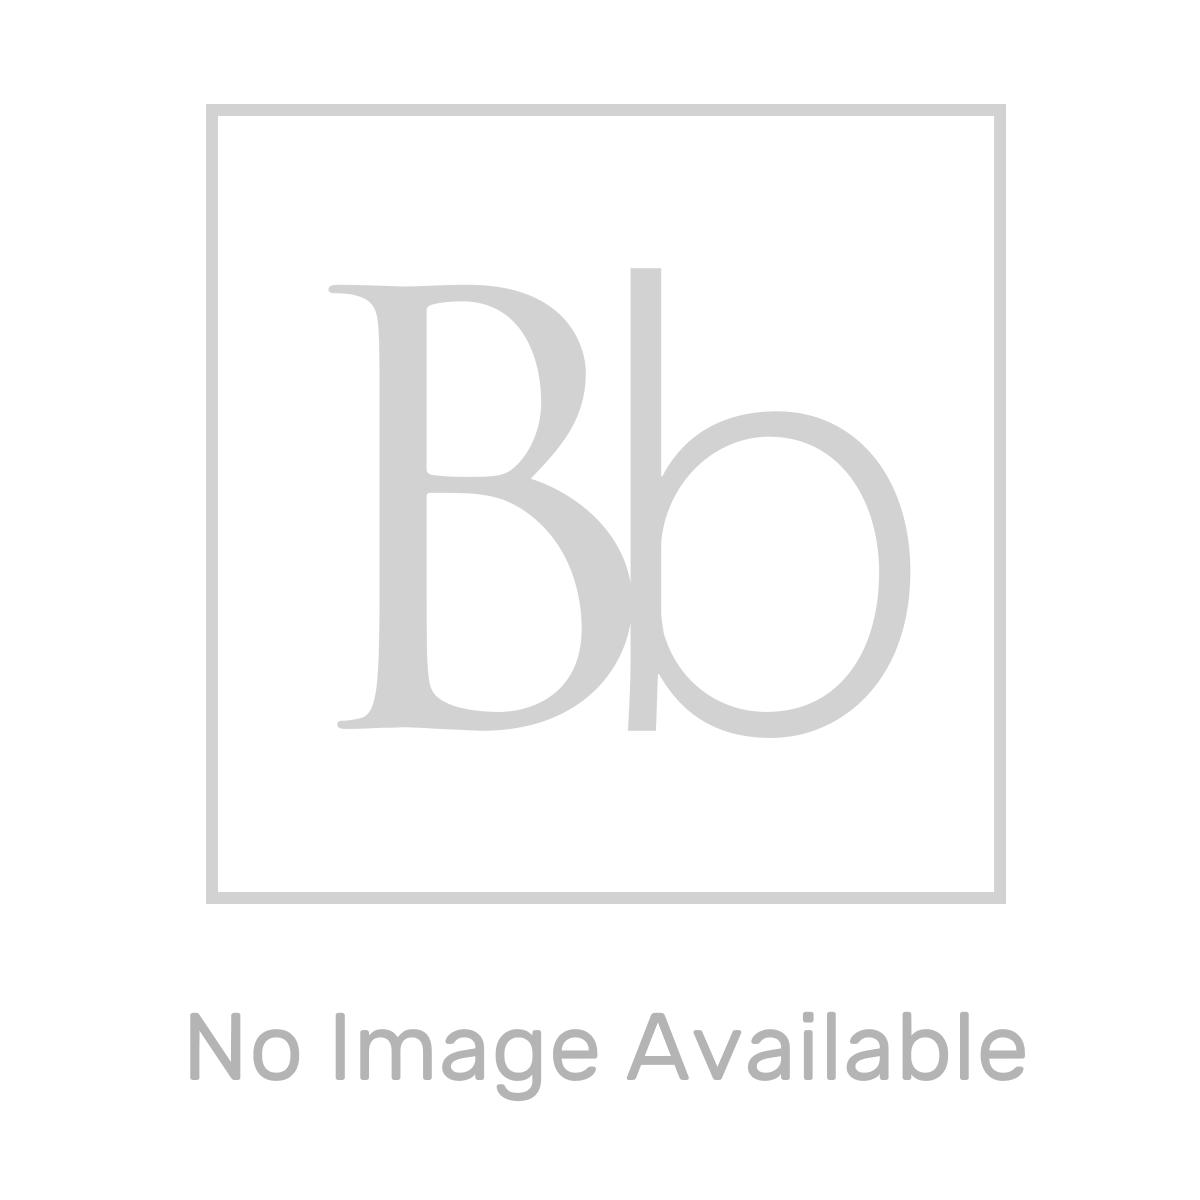 McAlpine WC-F26PV 4